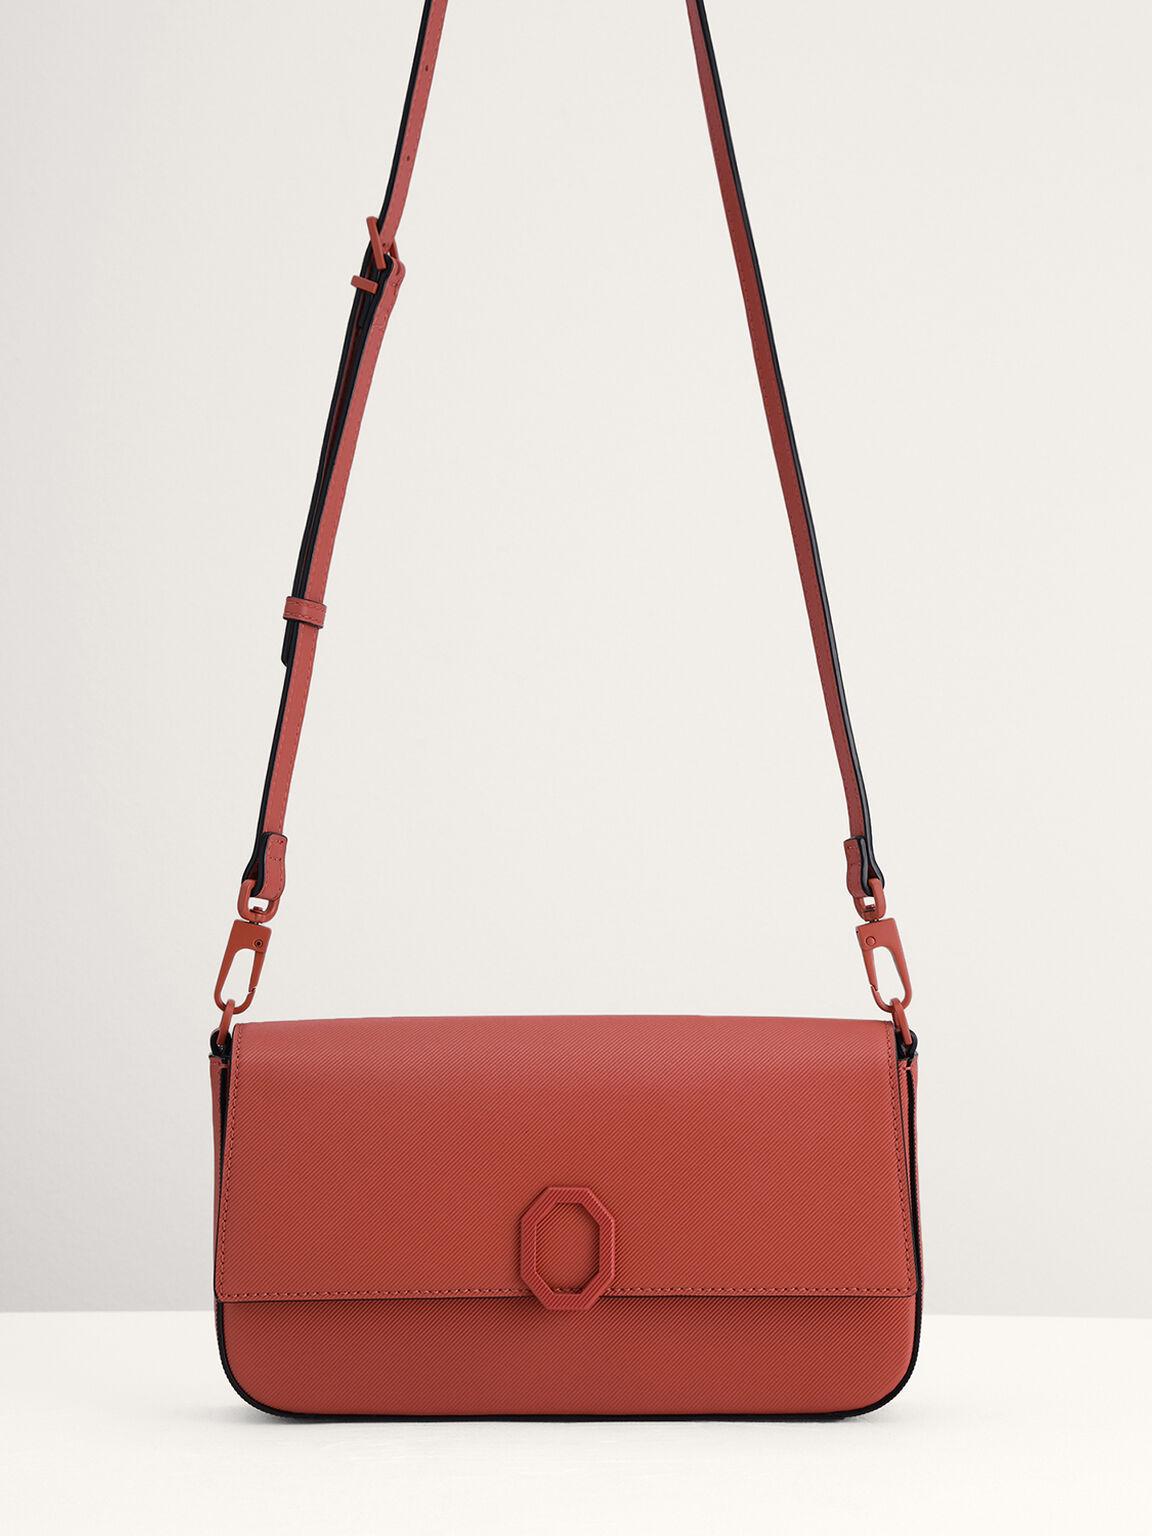 Leather Top Handle Bag, Brick, hi-res